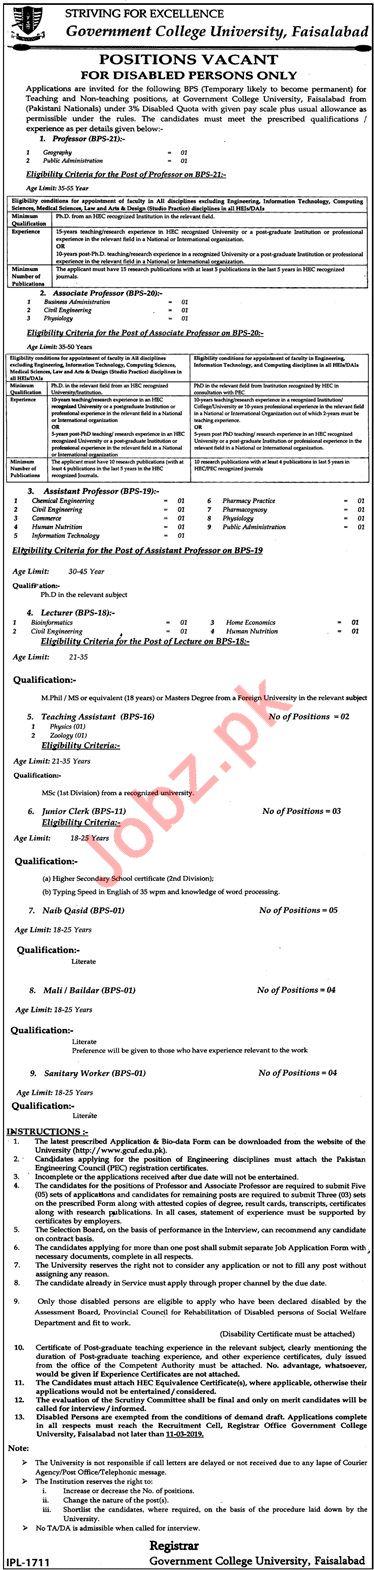 Govt College University Faisalabad GCUF Professors Jobs 2019